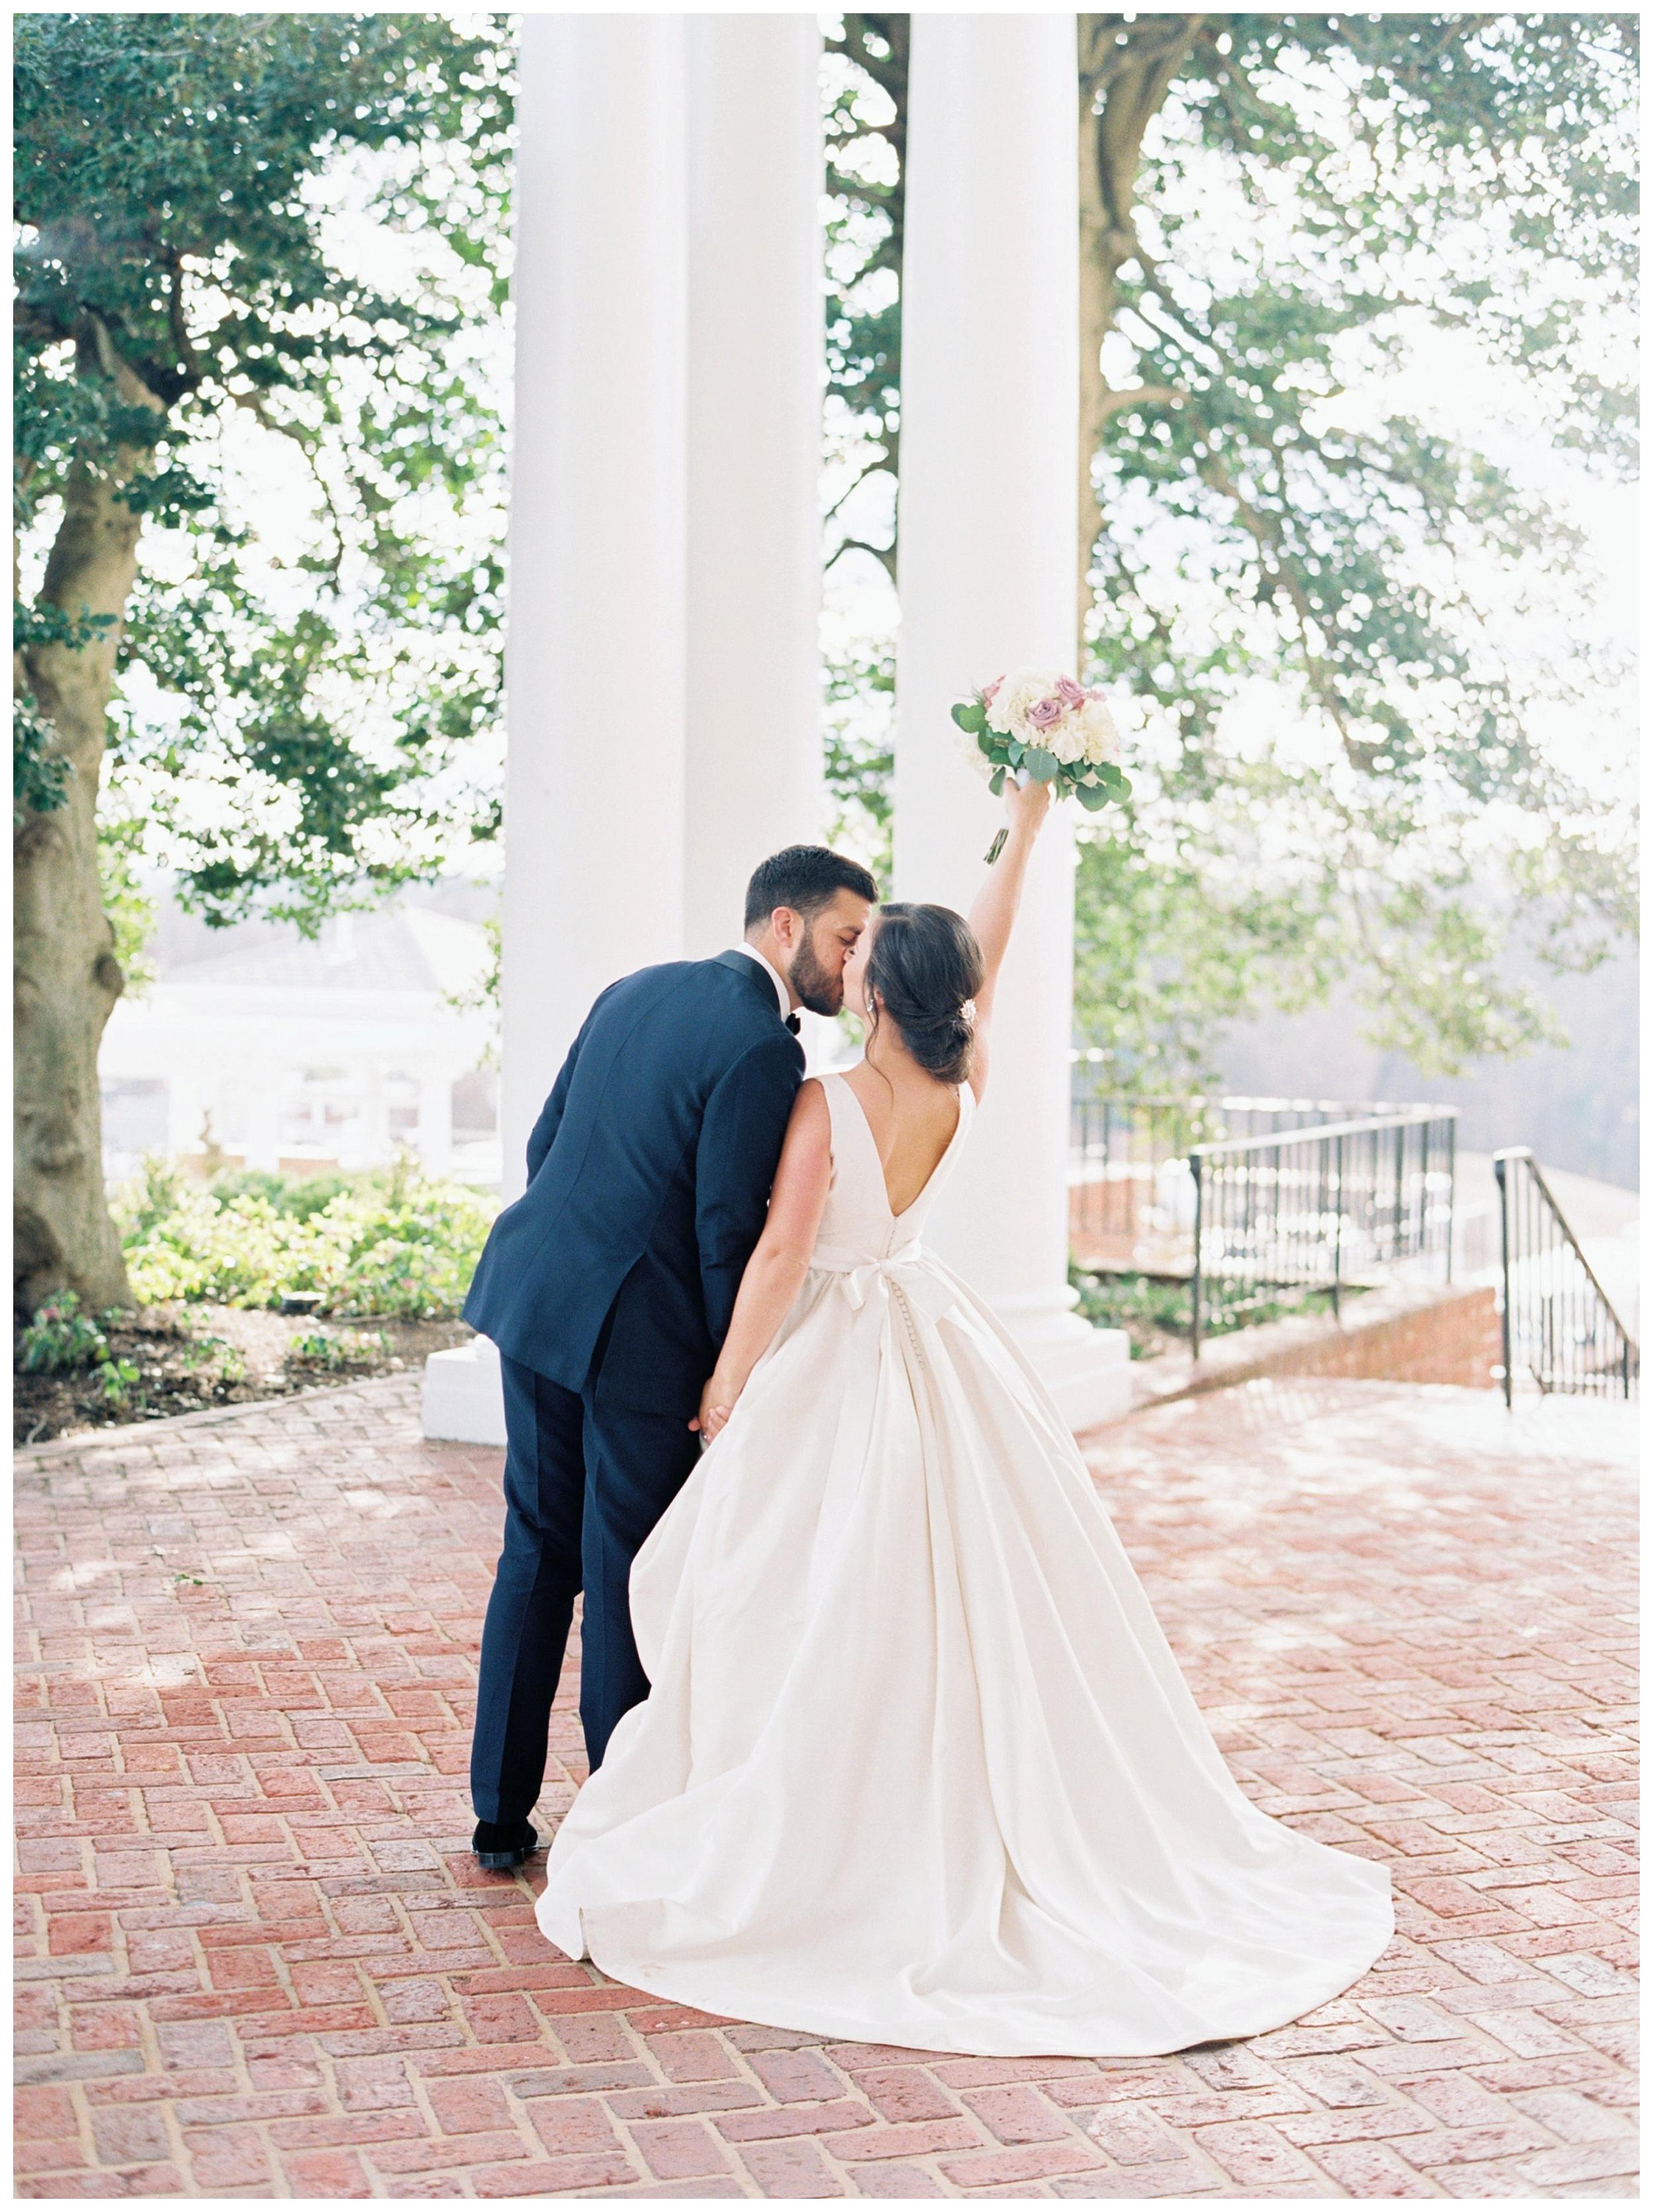 Country Club of Virginia Wedding | Richmond Wedding Photographer_0000.jpg